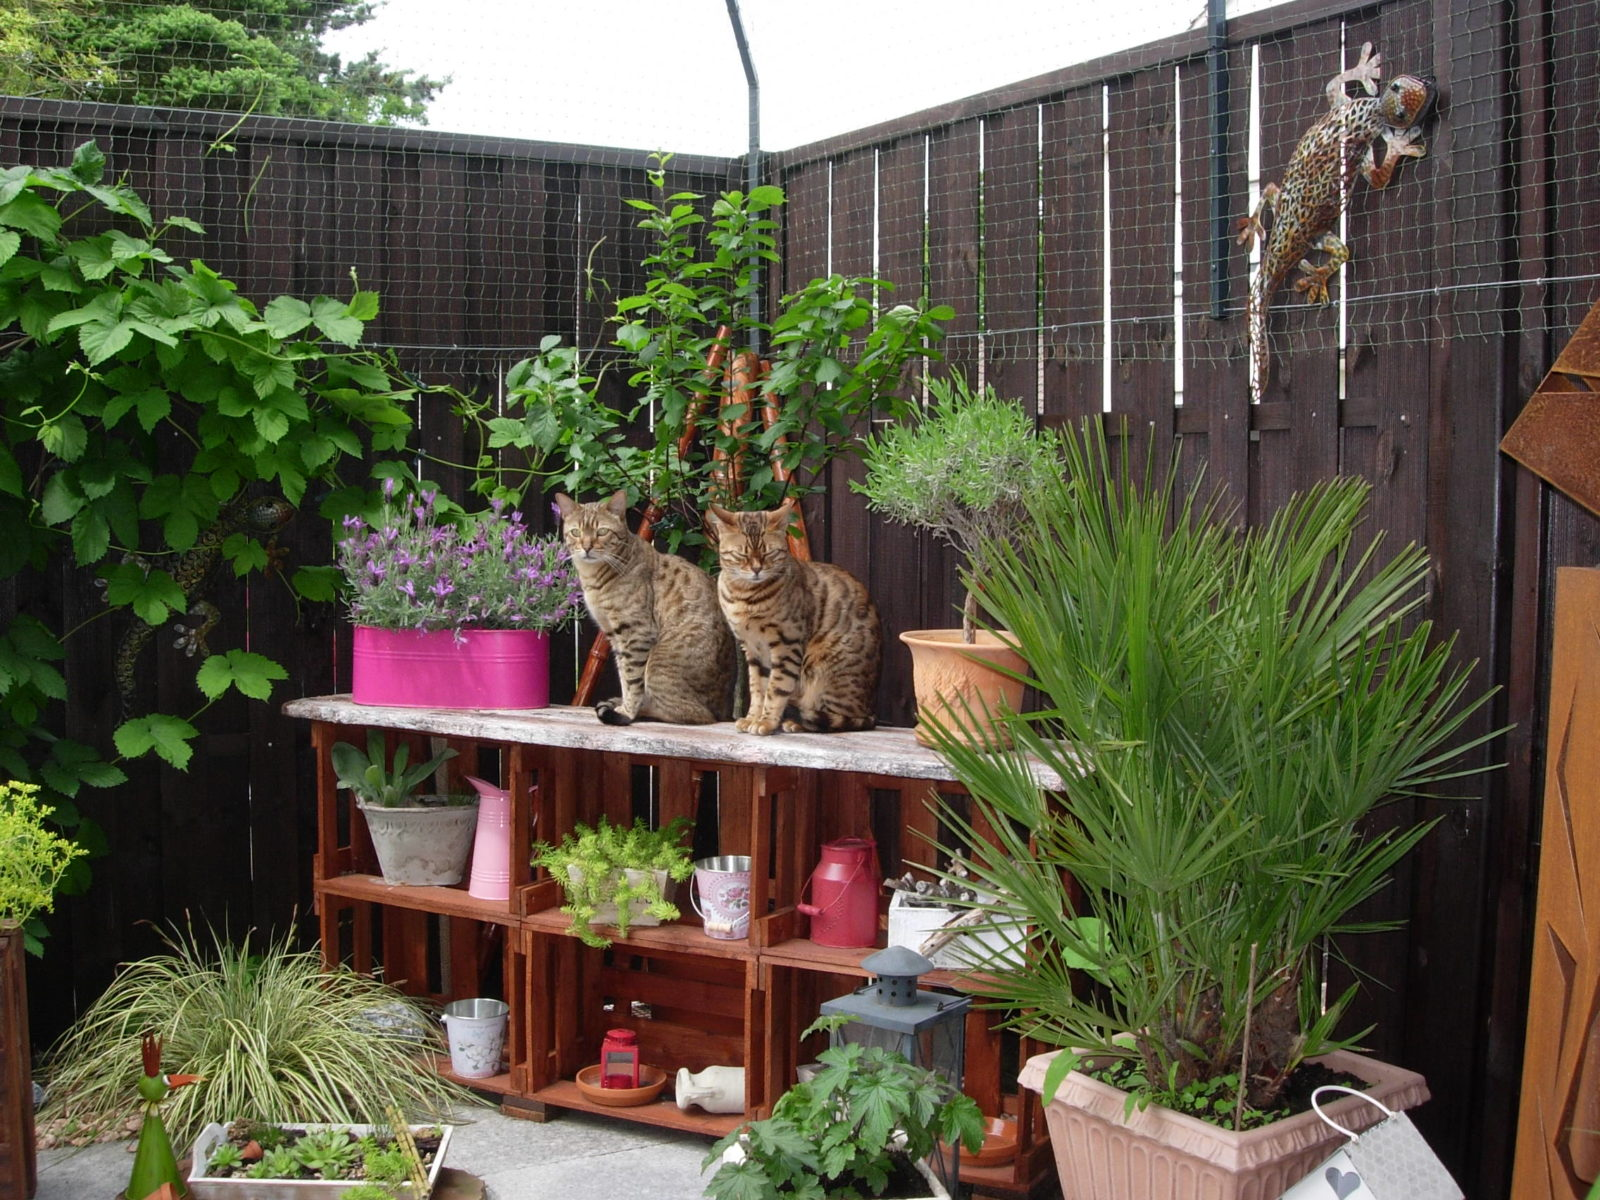 bengalkatzen-geniessen-den-freigang